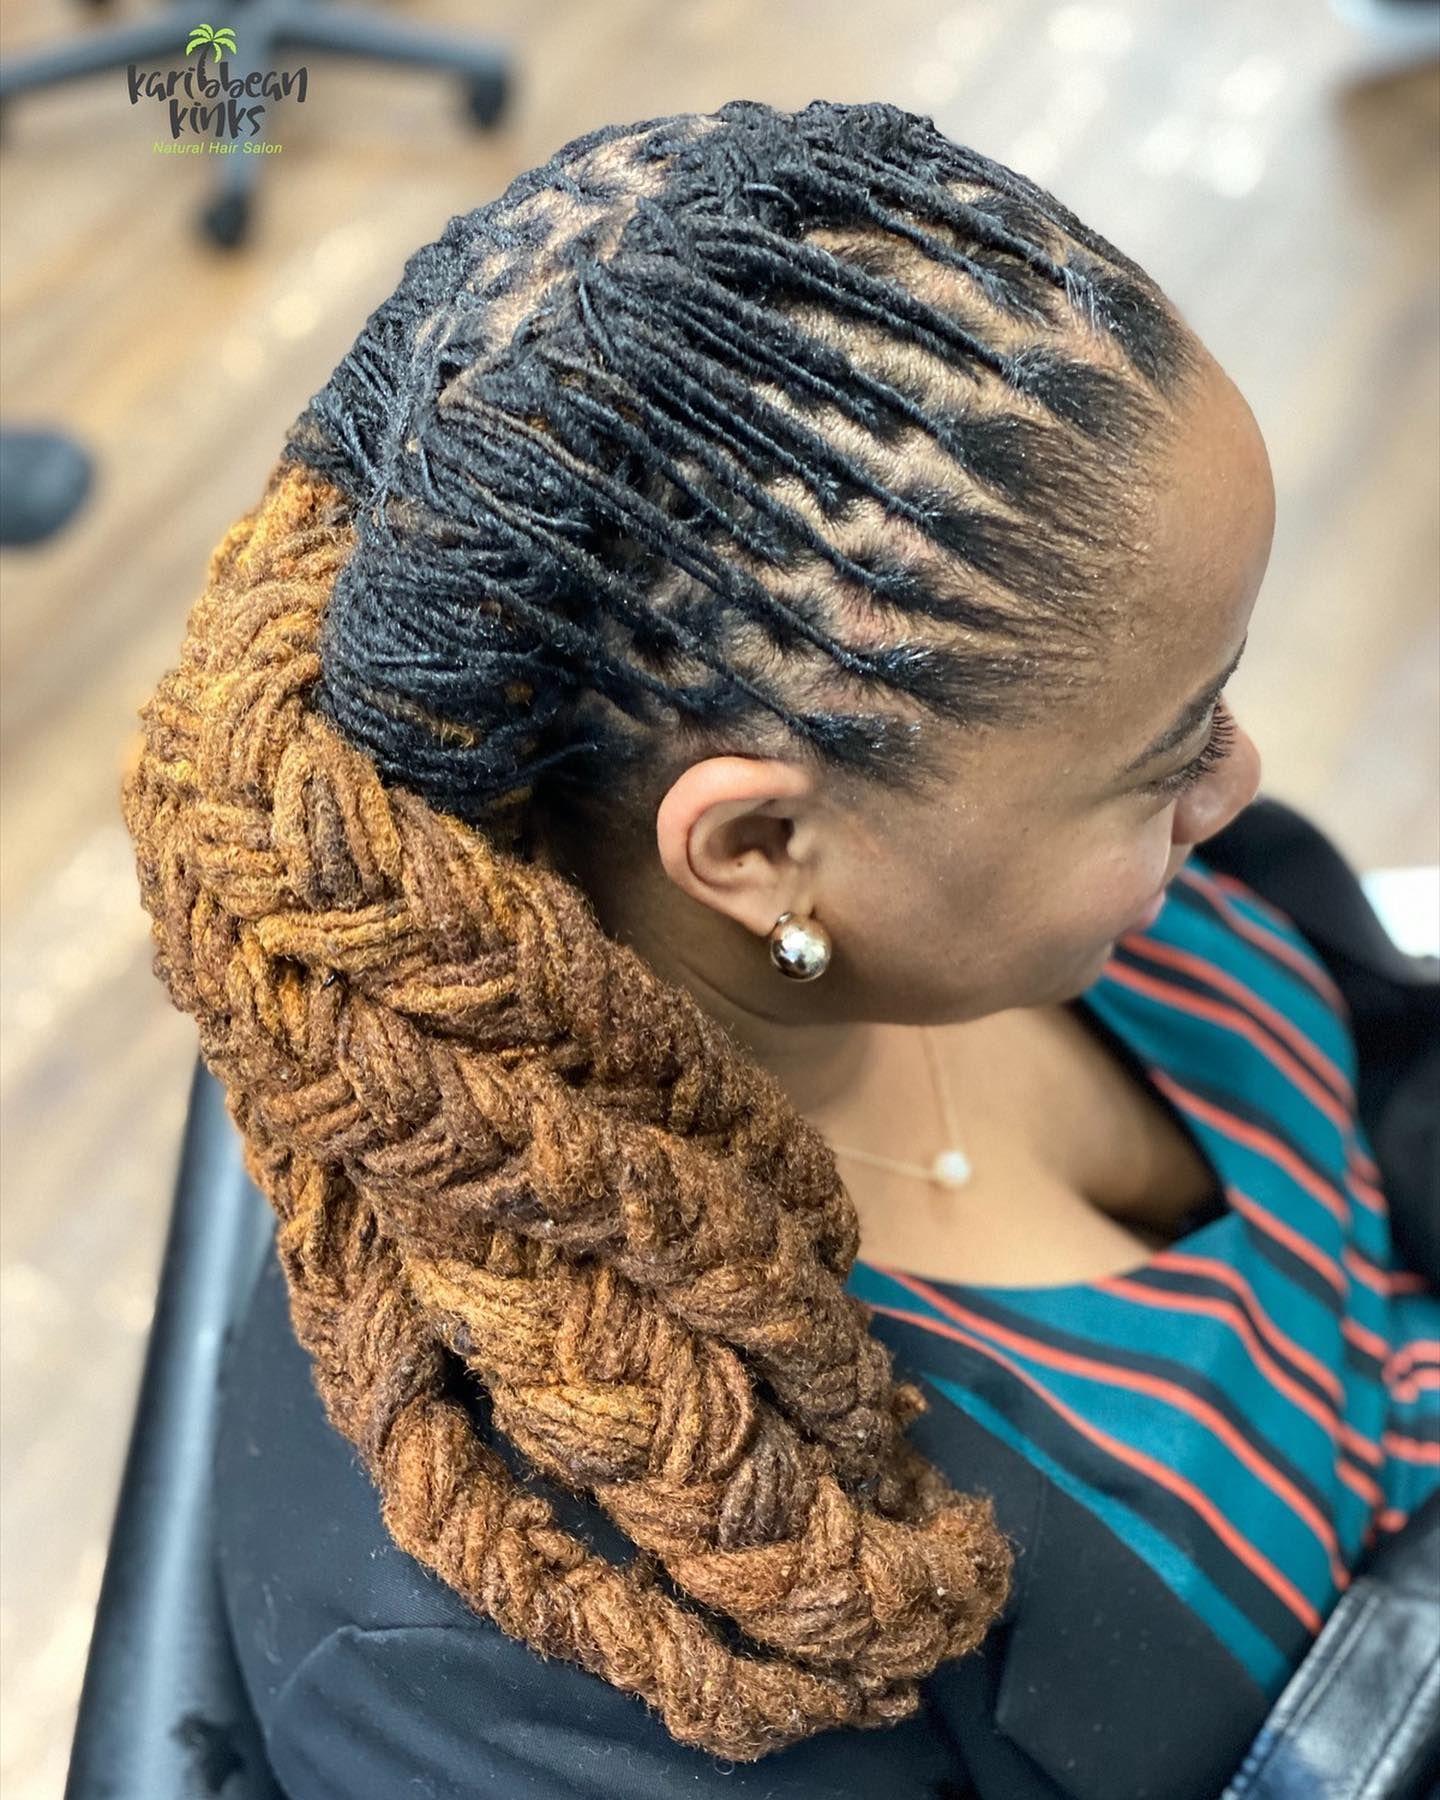 Women loc Stylessss 💚💚💚 KARIBBEAN KINKS NATURAL HAIR